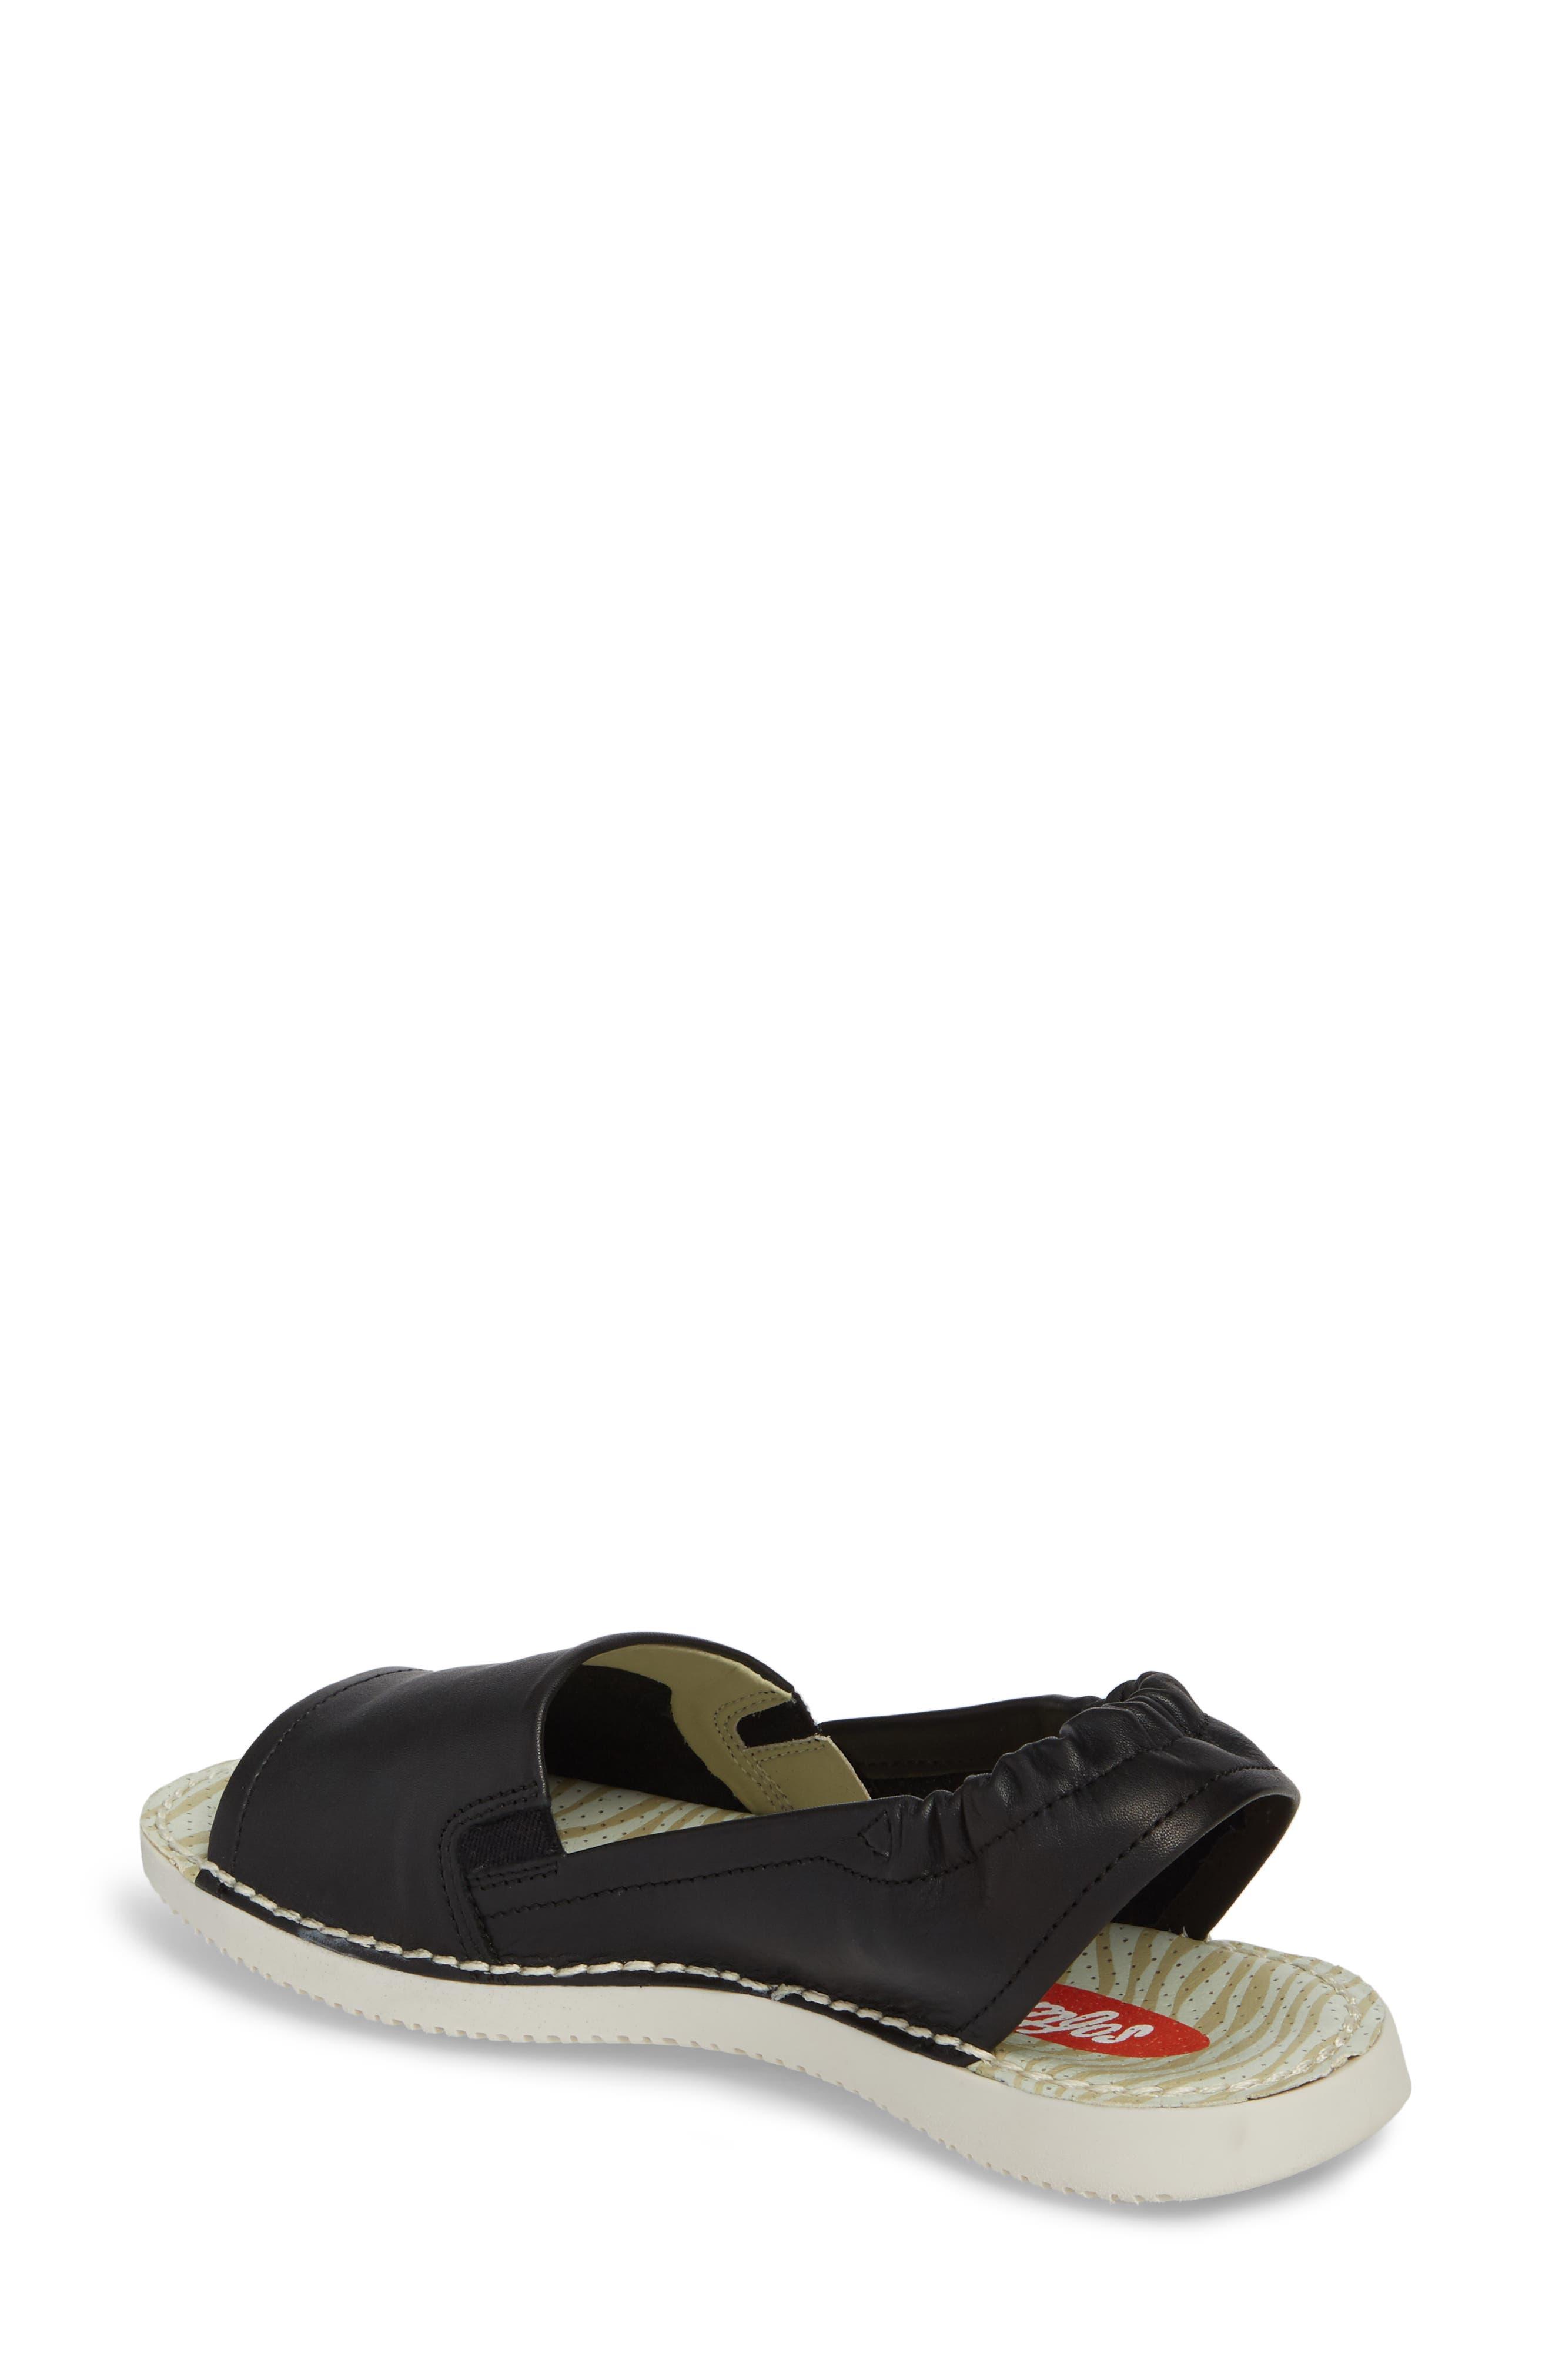 Tee Flat Sandal,                             Alternate thumbnail 2, color,                             Black Leather